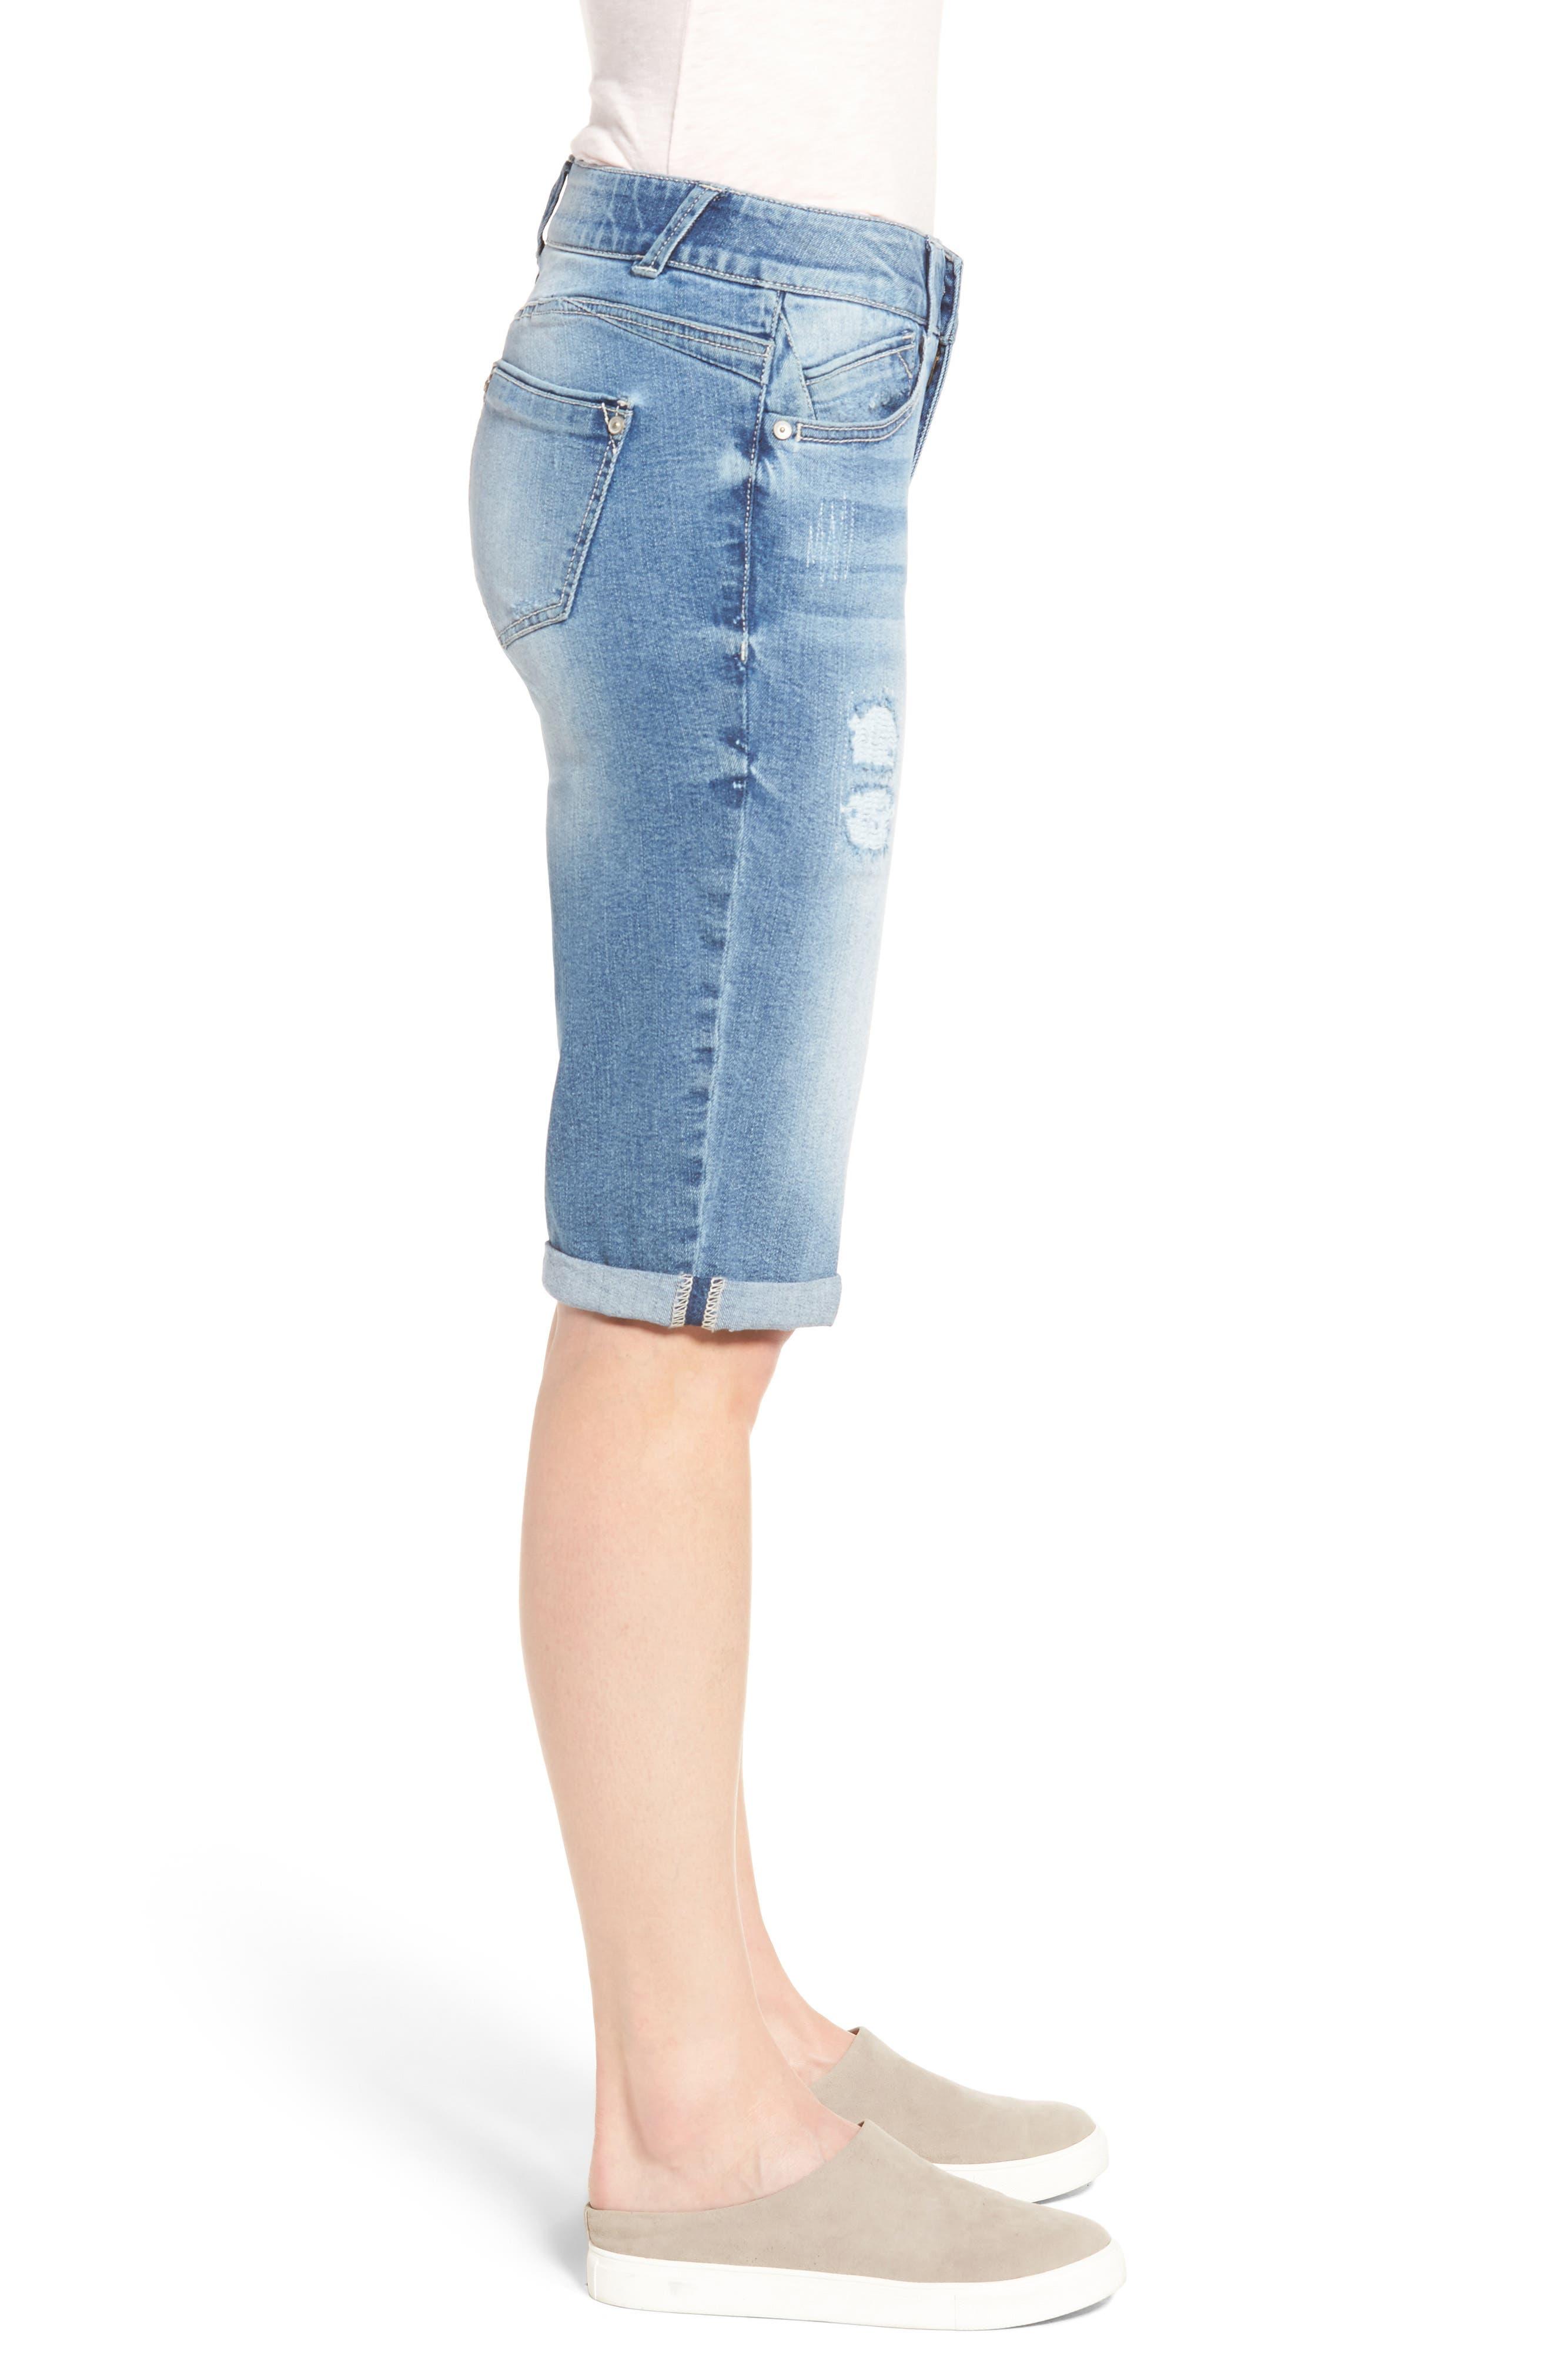 Alternate Image 3  - Wit & Wisdom Ab-solution Ripped Denim Bermuda Shorts (Regular & Petite) (Nordstrom Exclusive)